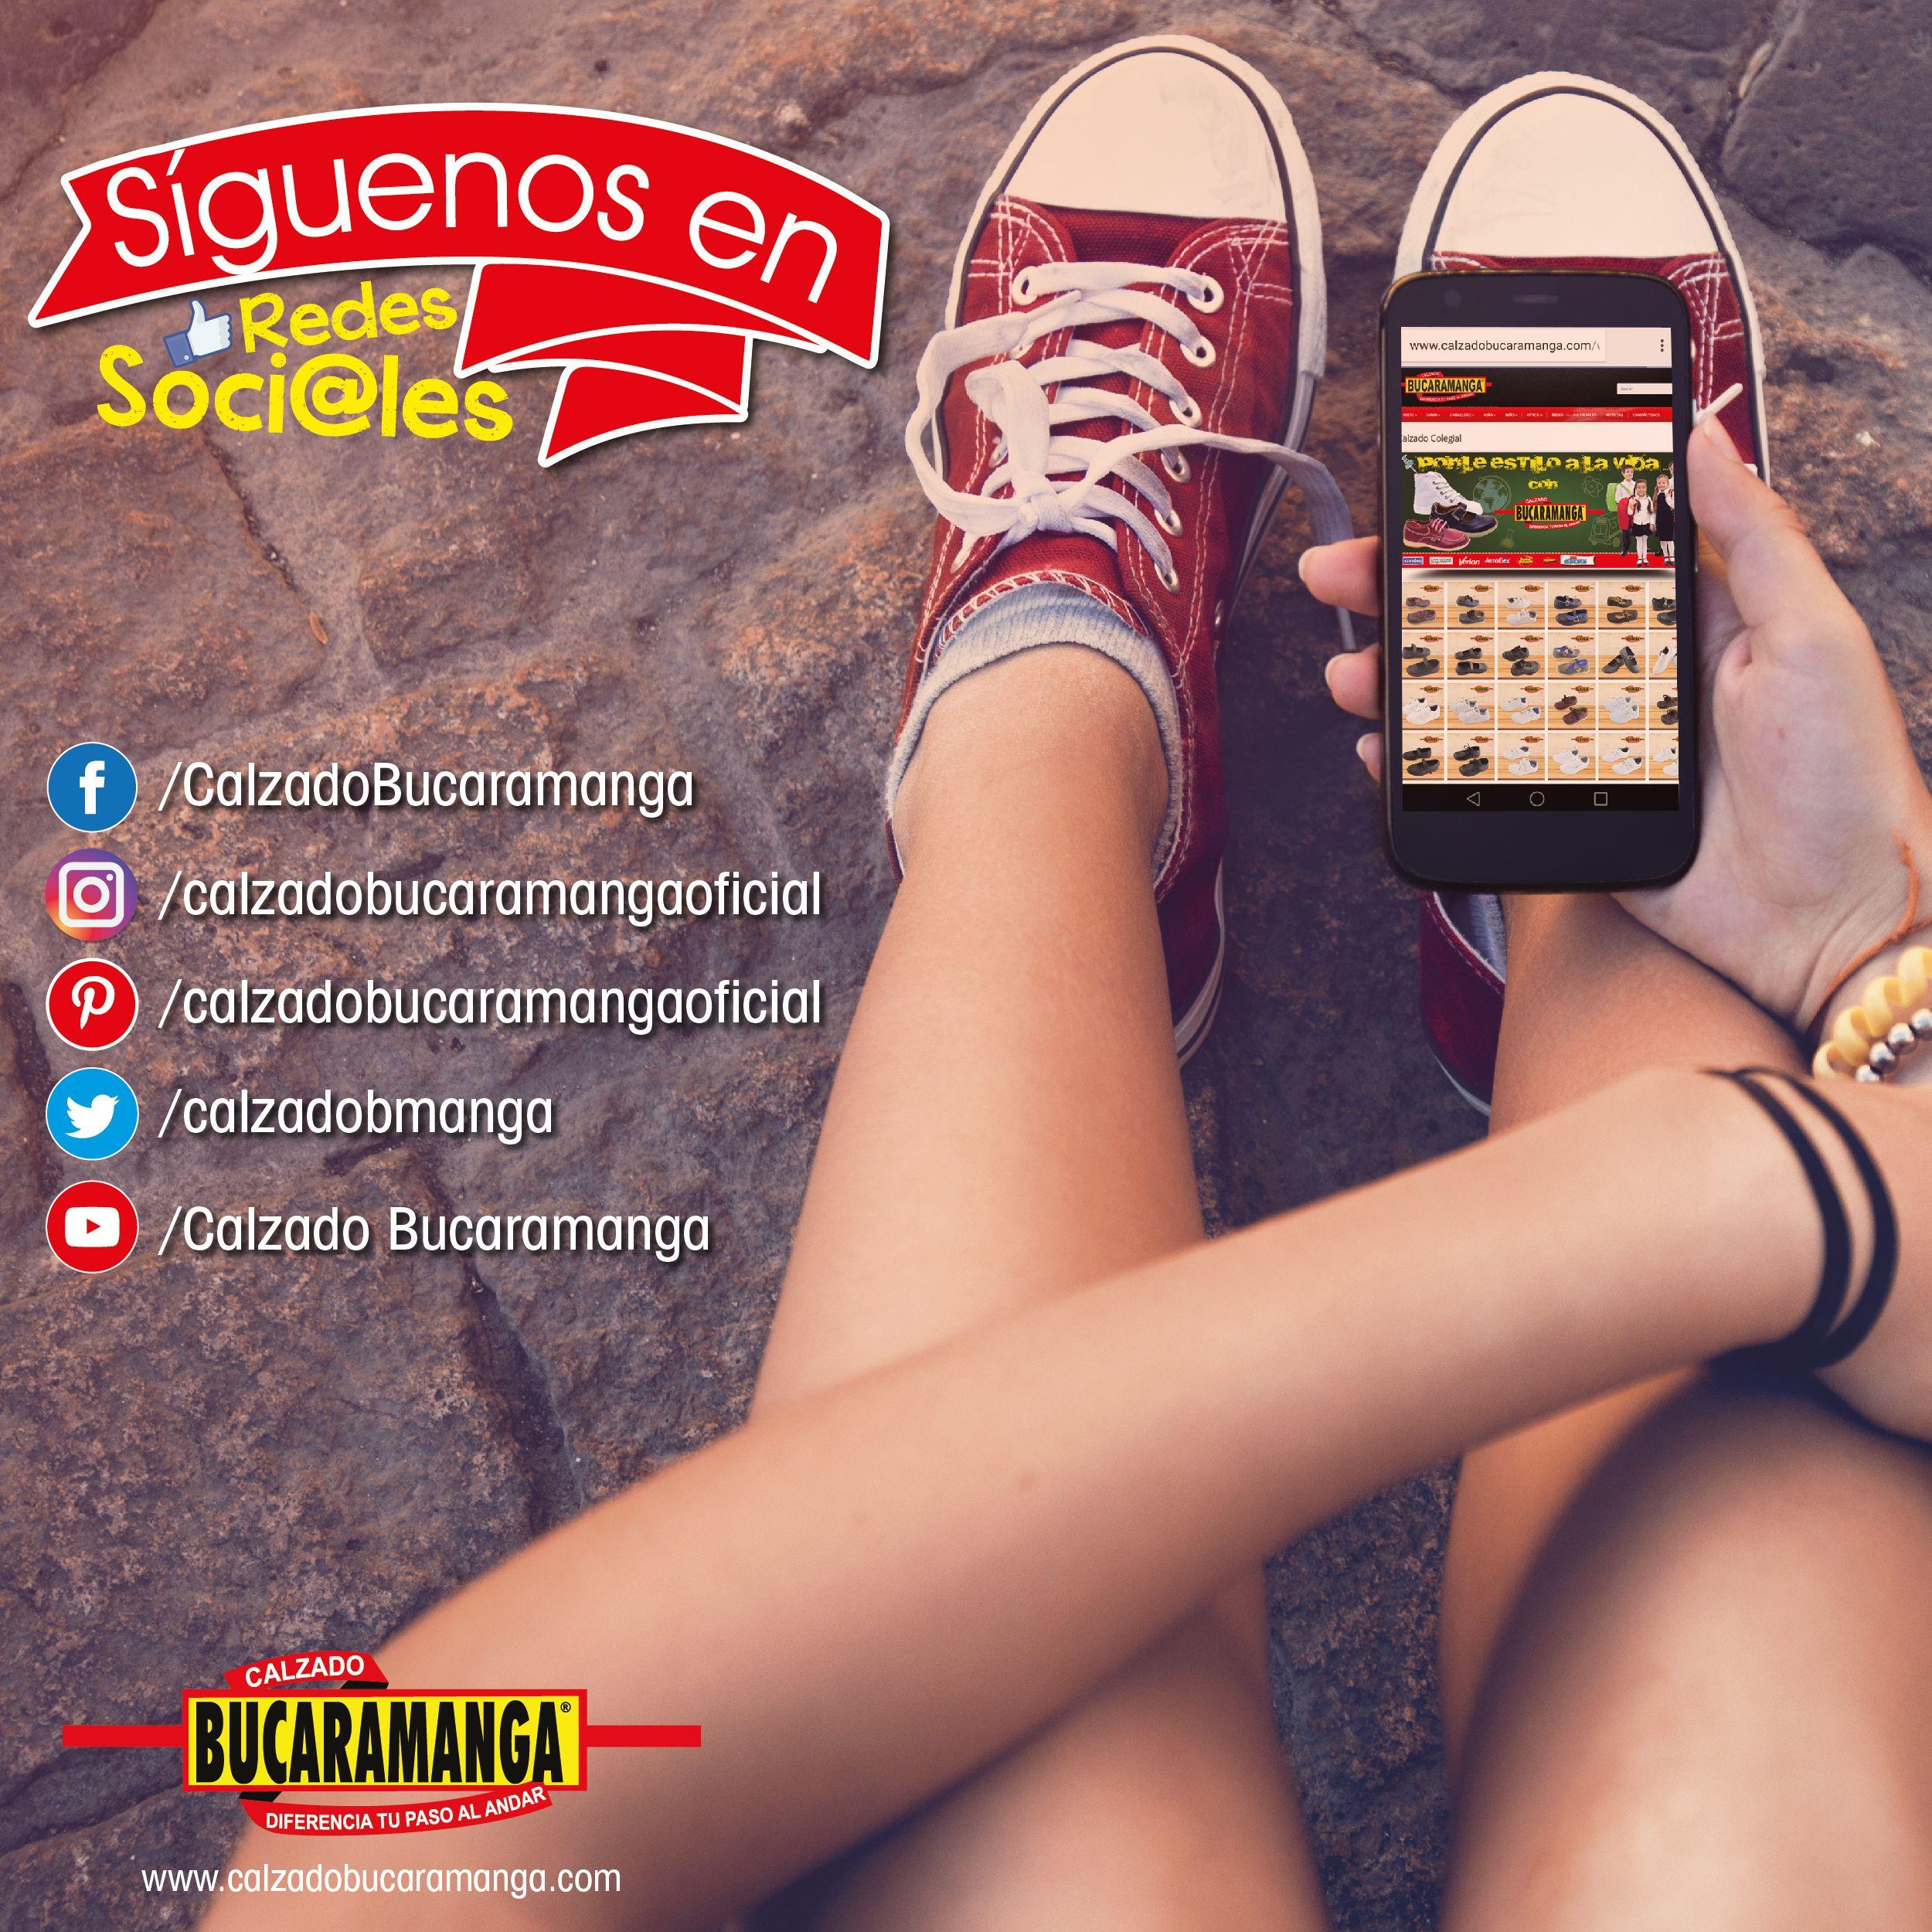 Mantente conectado con Calzado Bucaramanga ¡SIEMPRE!  Síguenos a través de todas nuestras RedesSociales ✅✅✅  🖥 www.calzadobucaramanga.com 📧 webmaster@calzadobucaramanga.com  #Instagram #Facebook #Twitter #Pinterest #Google+ #Youtube#Zapatos #Calzado #Moda #Tacones #Familia #look